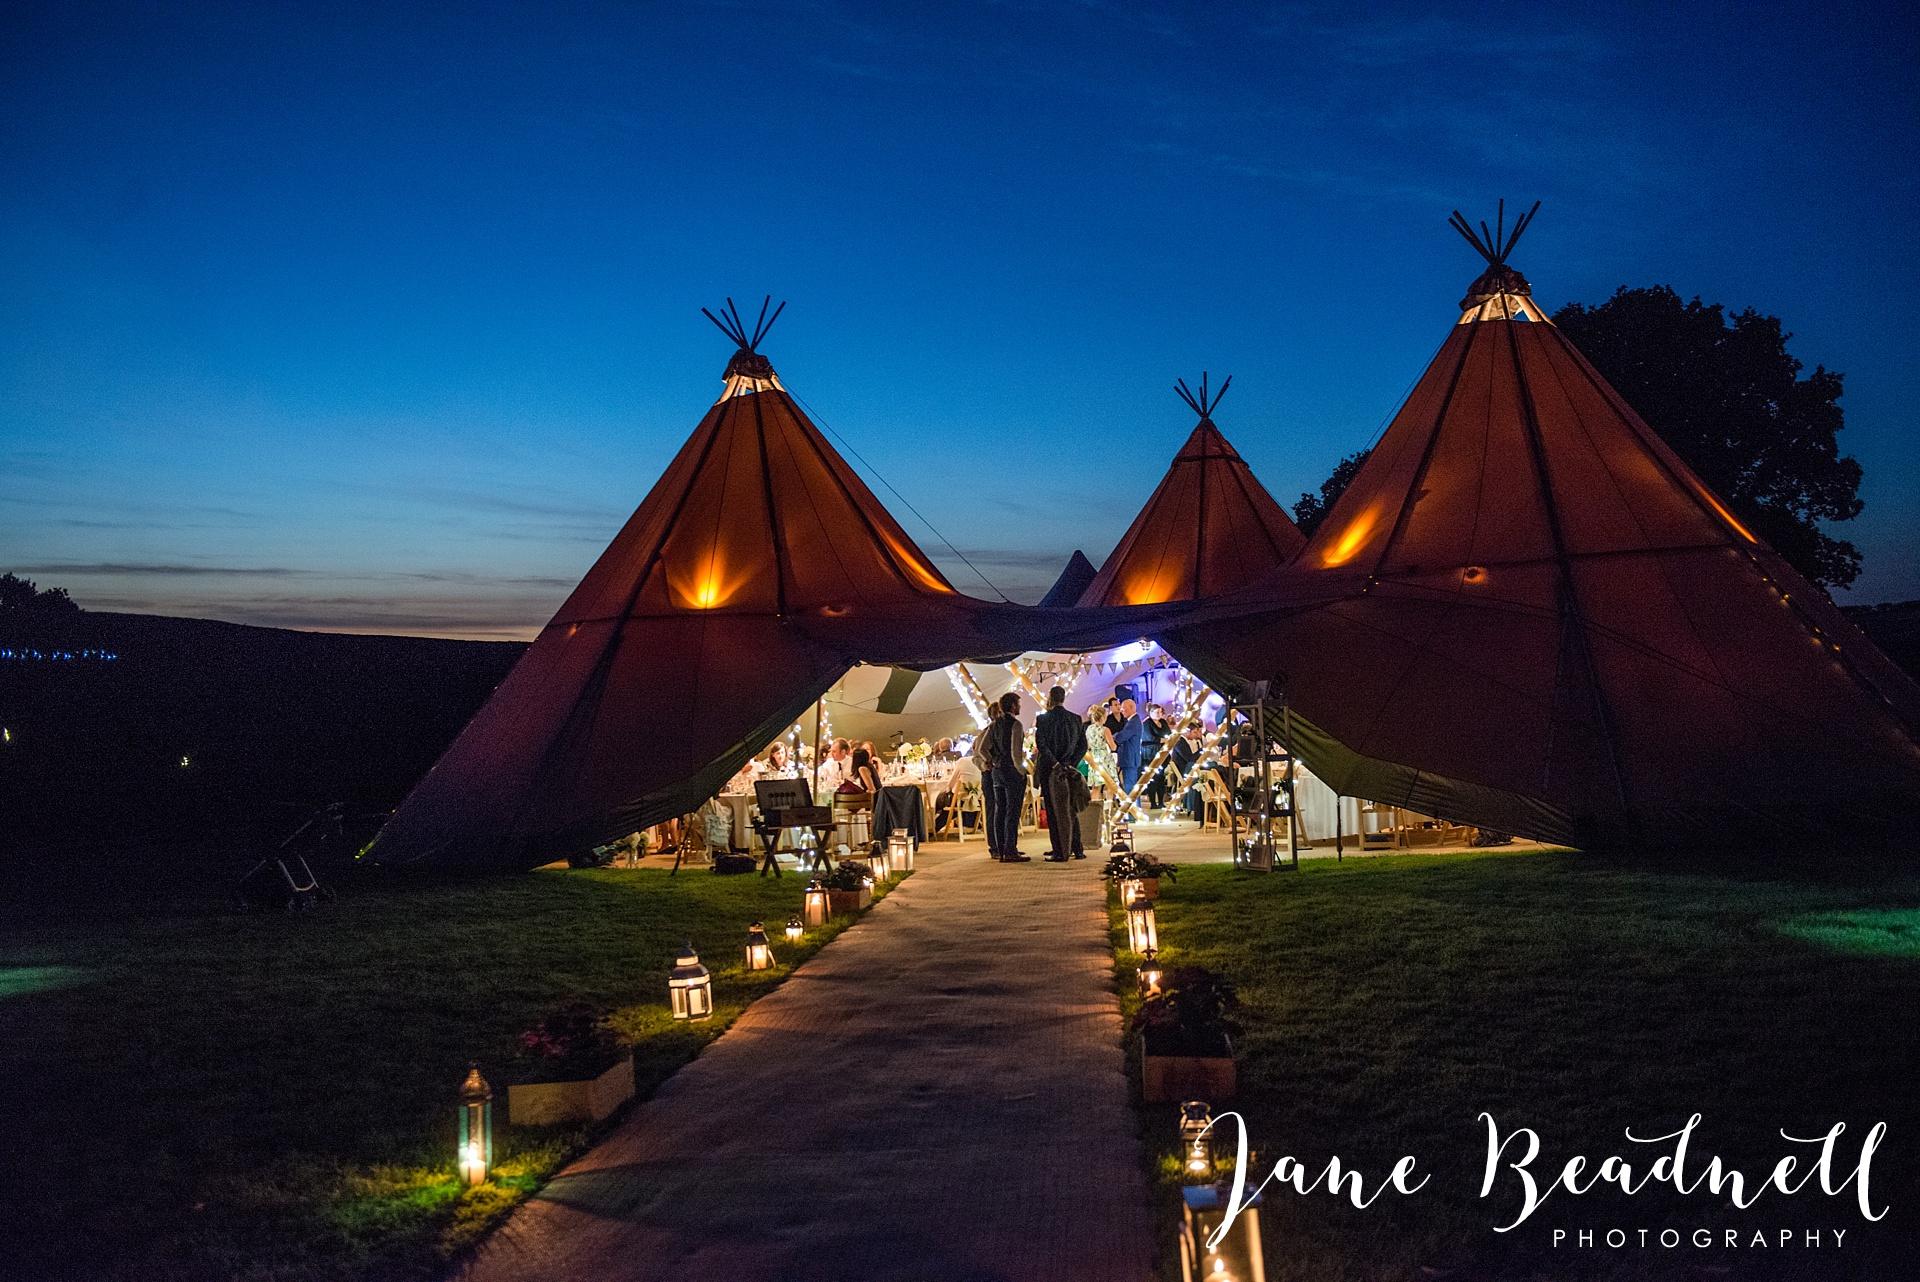 fine-art-wedding-photographer-jane-beadnell-yorkshire-wedding-photographer_0163